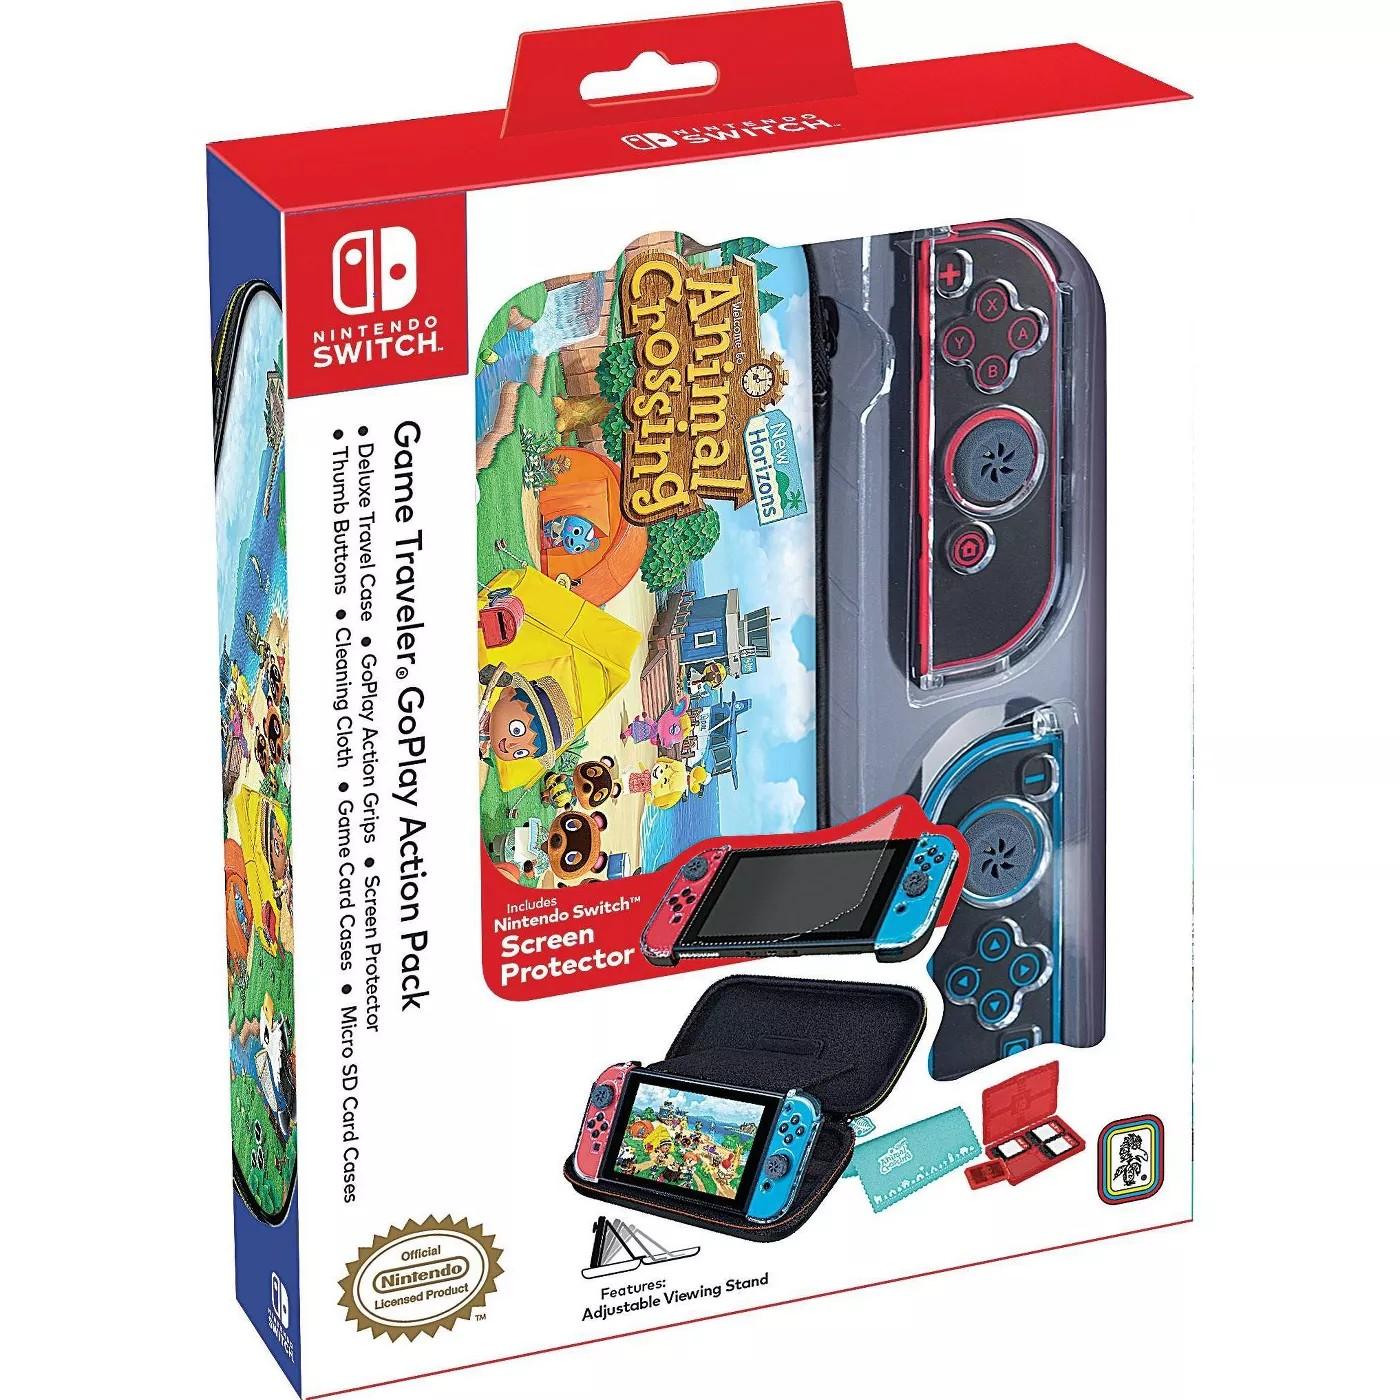 Защитный чехол Nintendo Switch Game Traveler GoPlay Action Pack - Animal Crossing New Horizons SWITCH + Lite